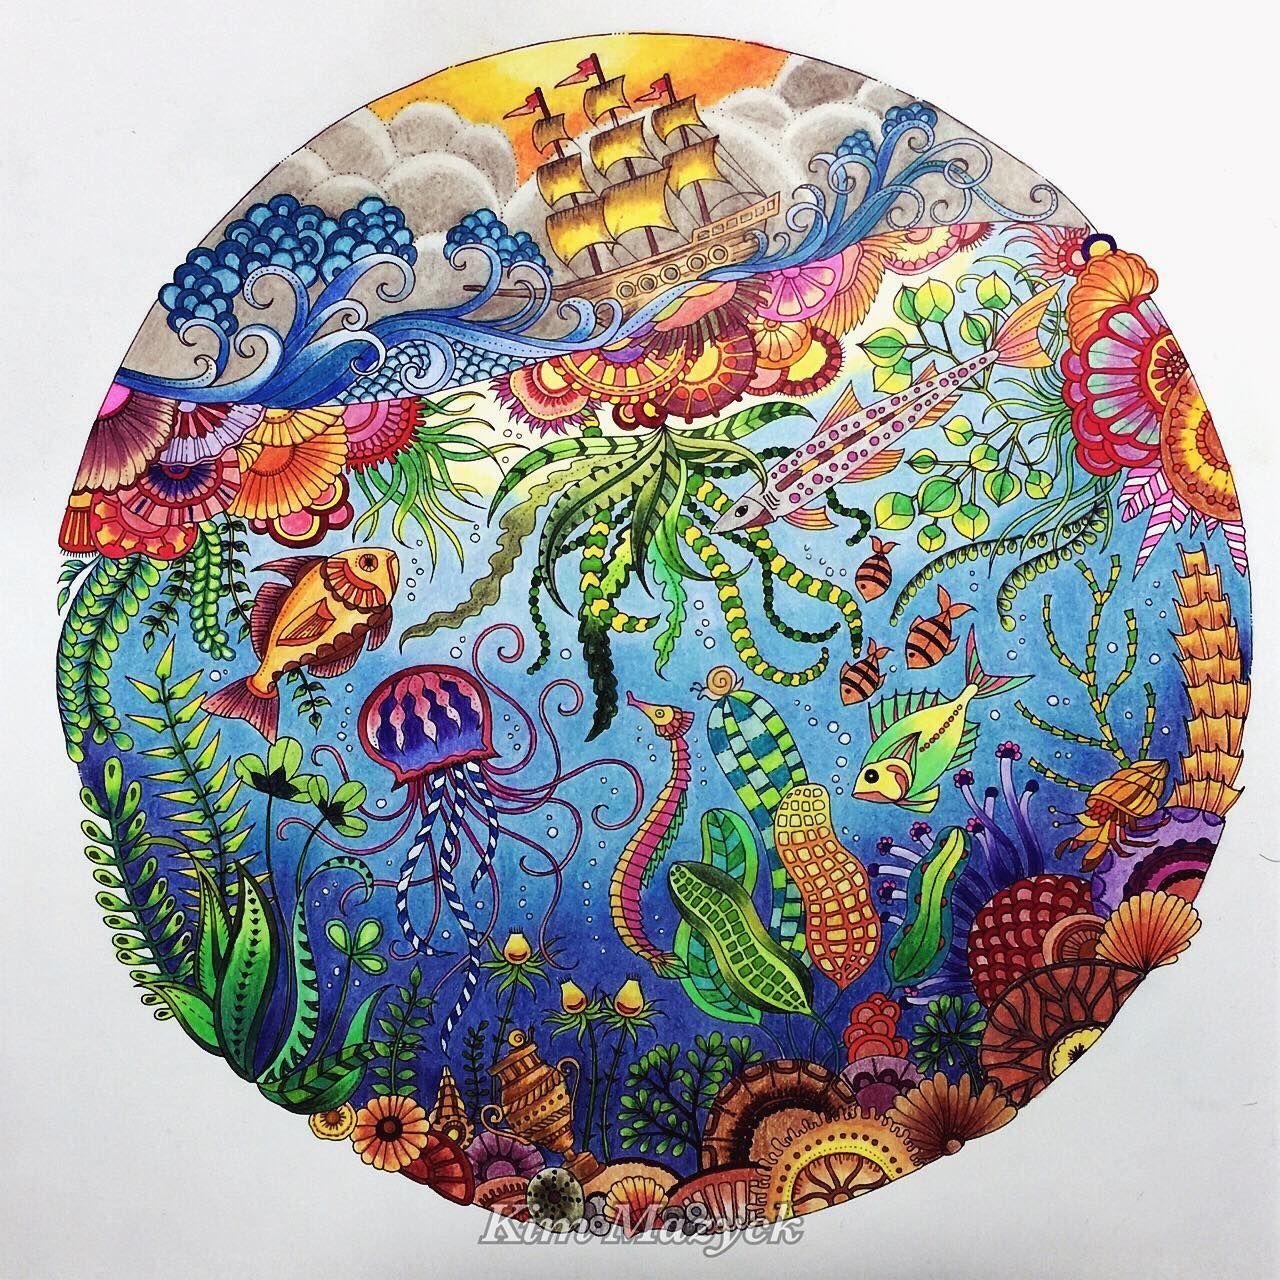 Johanna Basford S Lost Ocean Lost Ocean Coloring Book Johanna Basford Coloring Johanna Basford Coloring Book